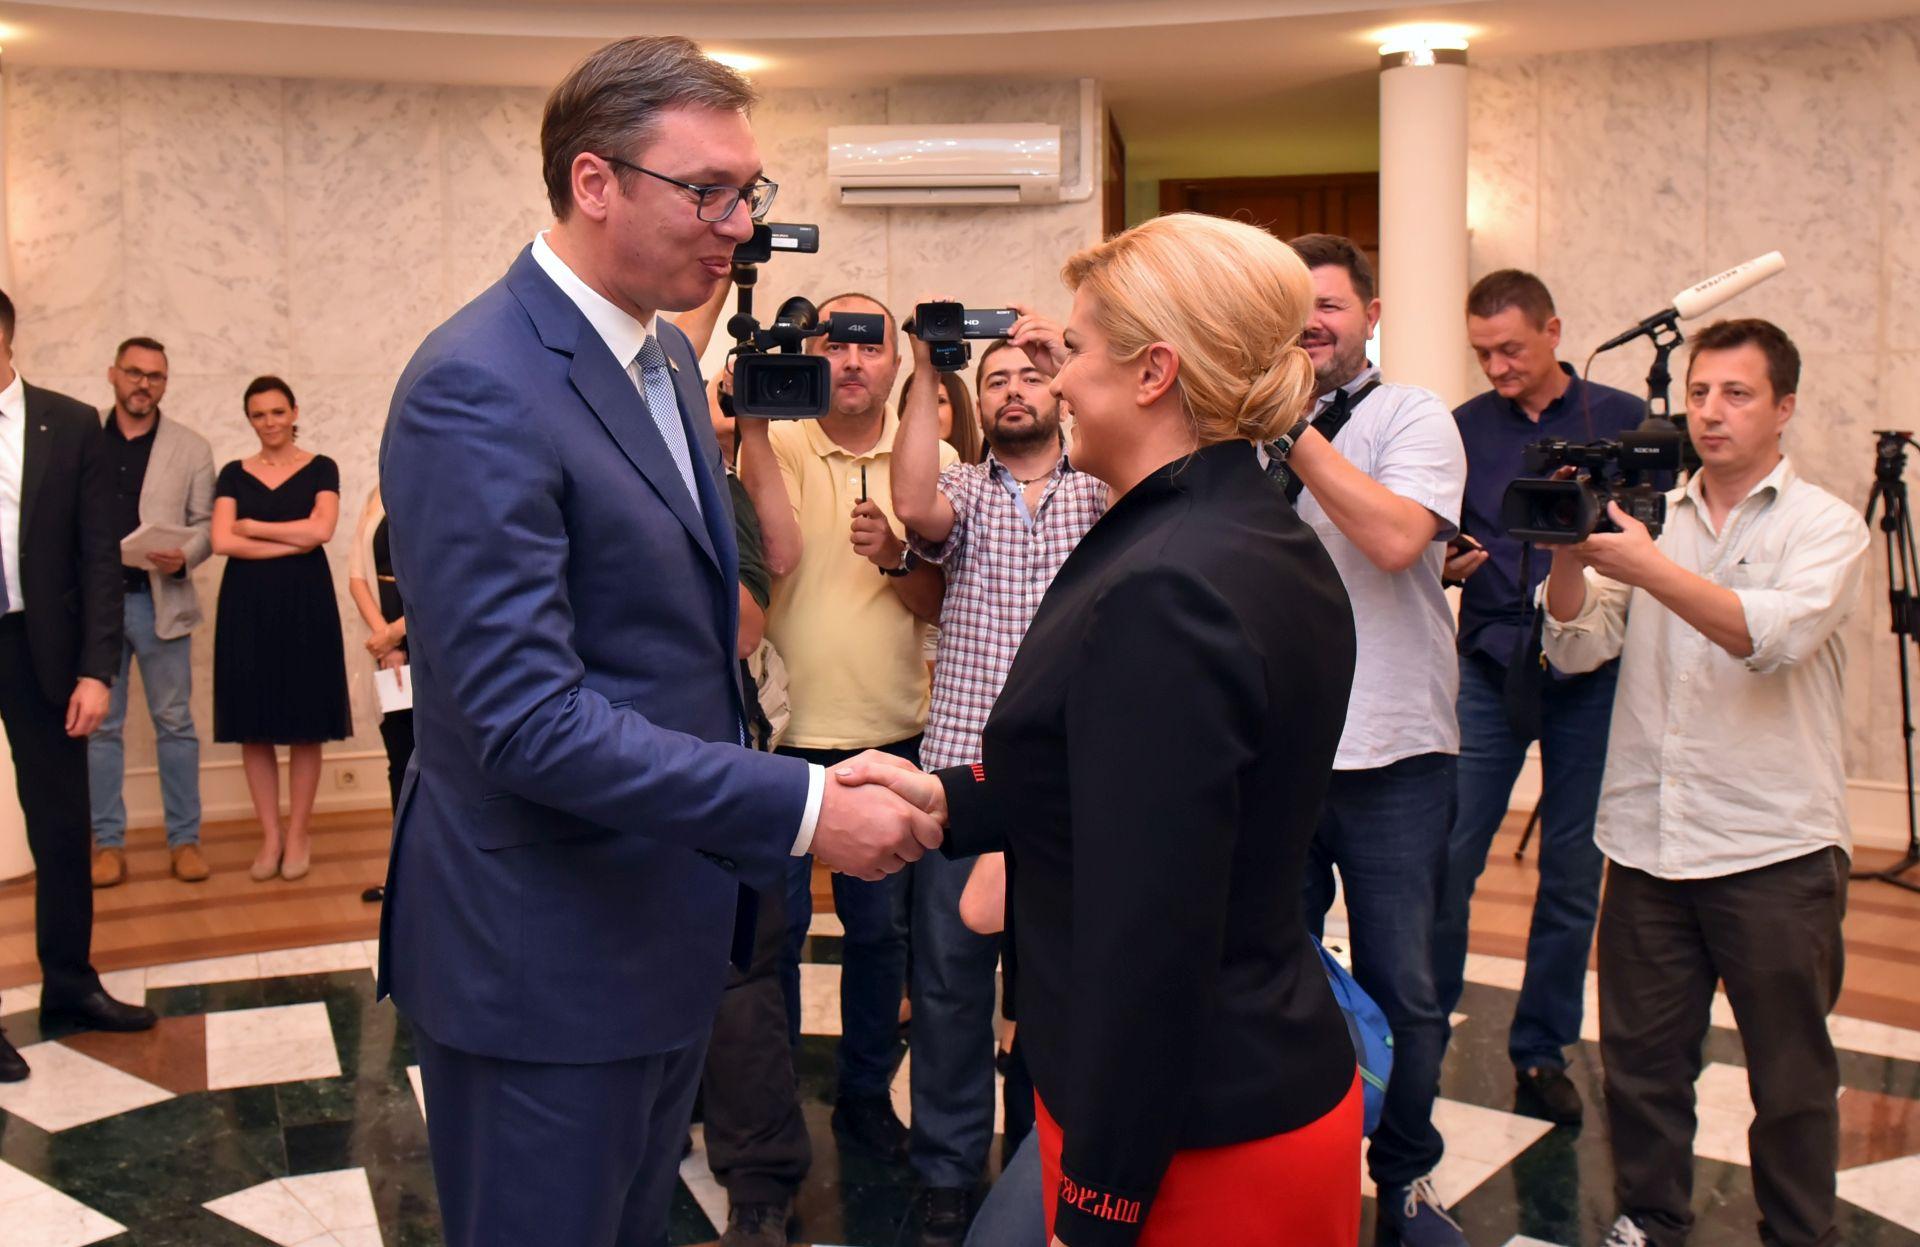 ALEKSANDAR VUČIĆ: A vi Hrvati valjda niste počinili zločin u Jasenovcu…